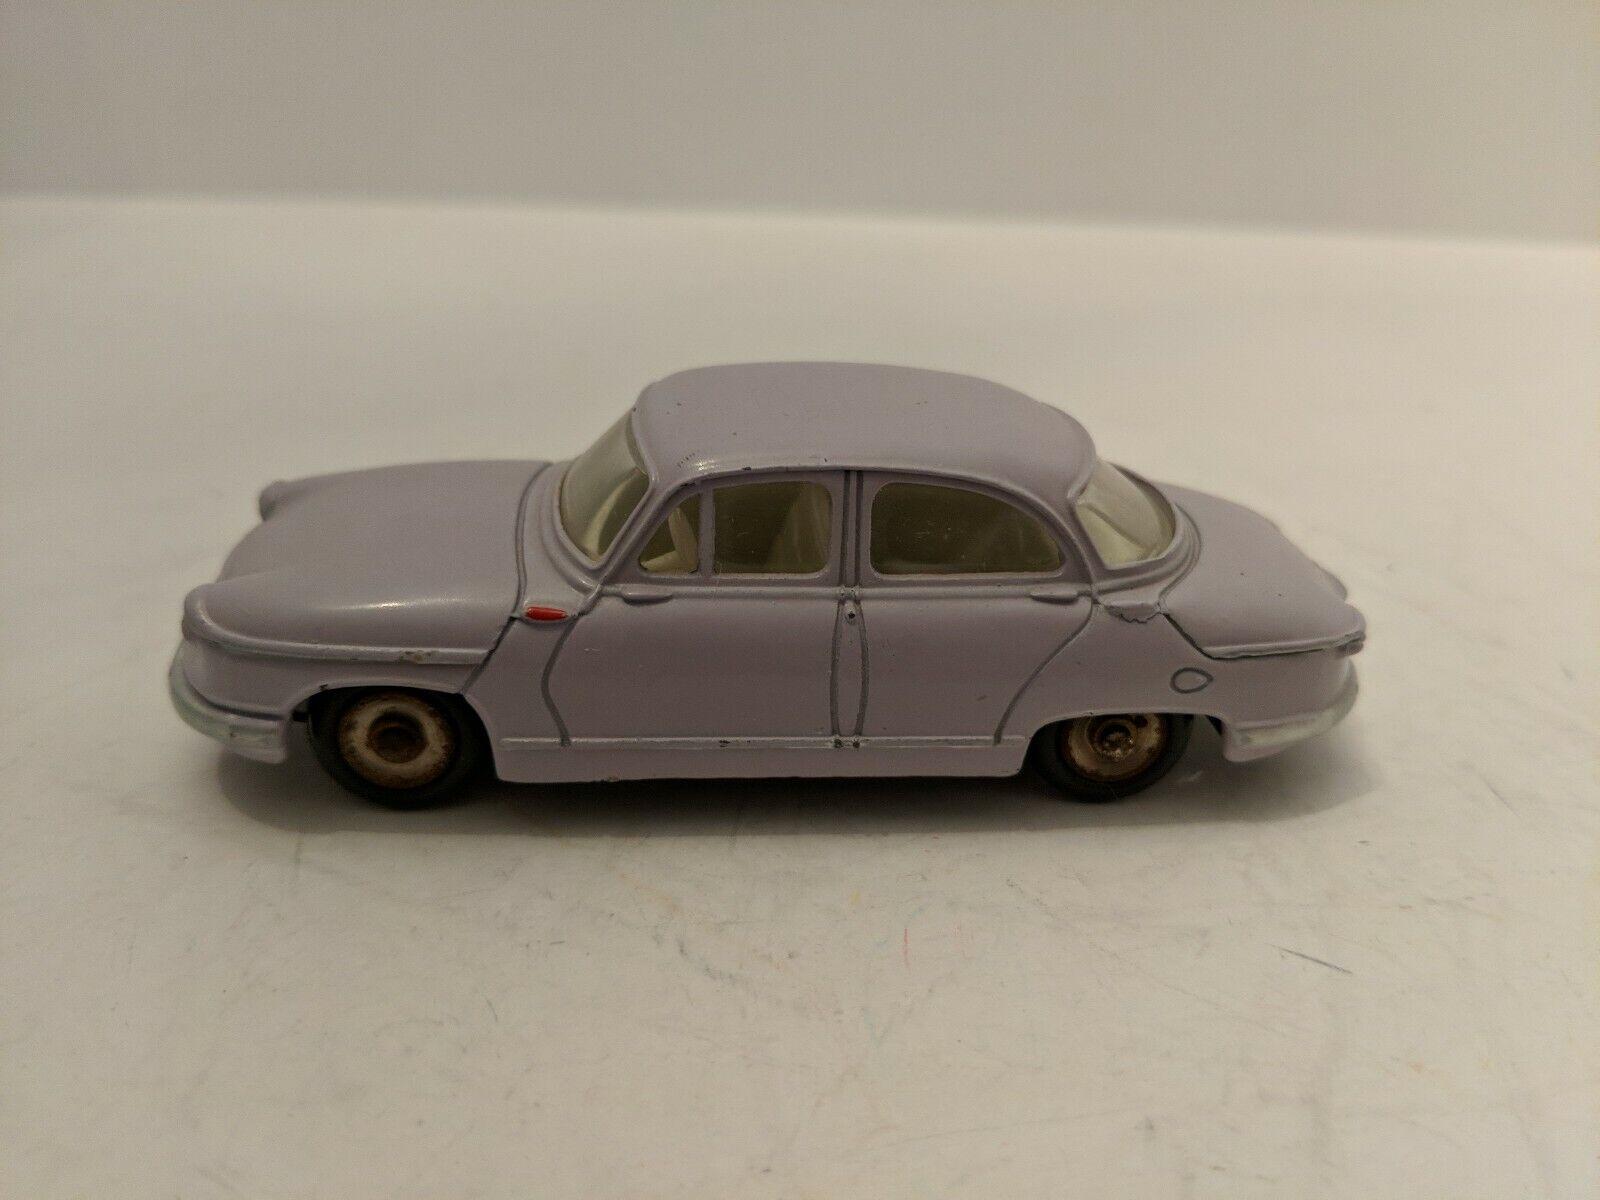 Dinky Toys 547 Panhard PL17  1960-1969 Car, lavender Coloreee